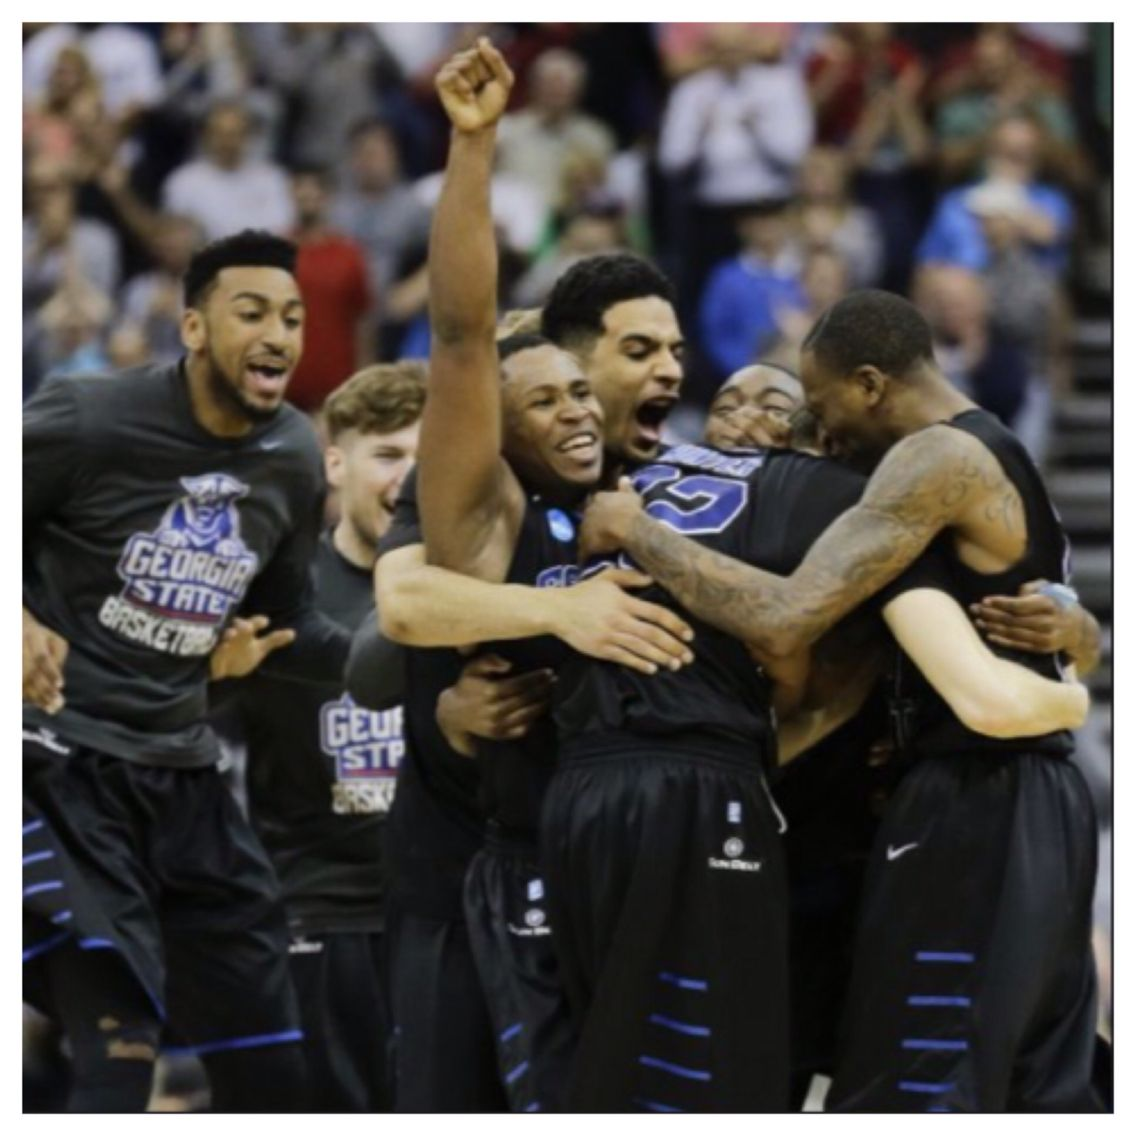 NCAA TOURNAMENT 2015 Ga State v Baylor Sports photograph